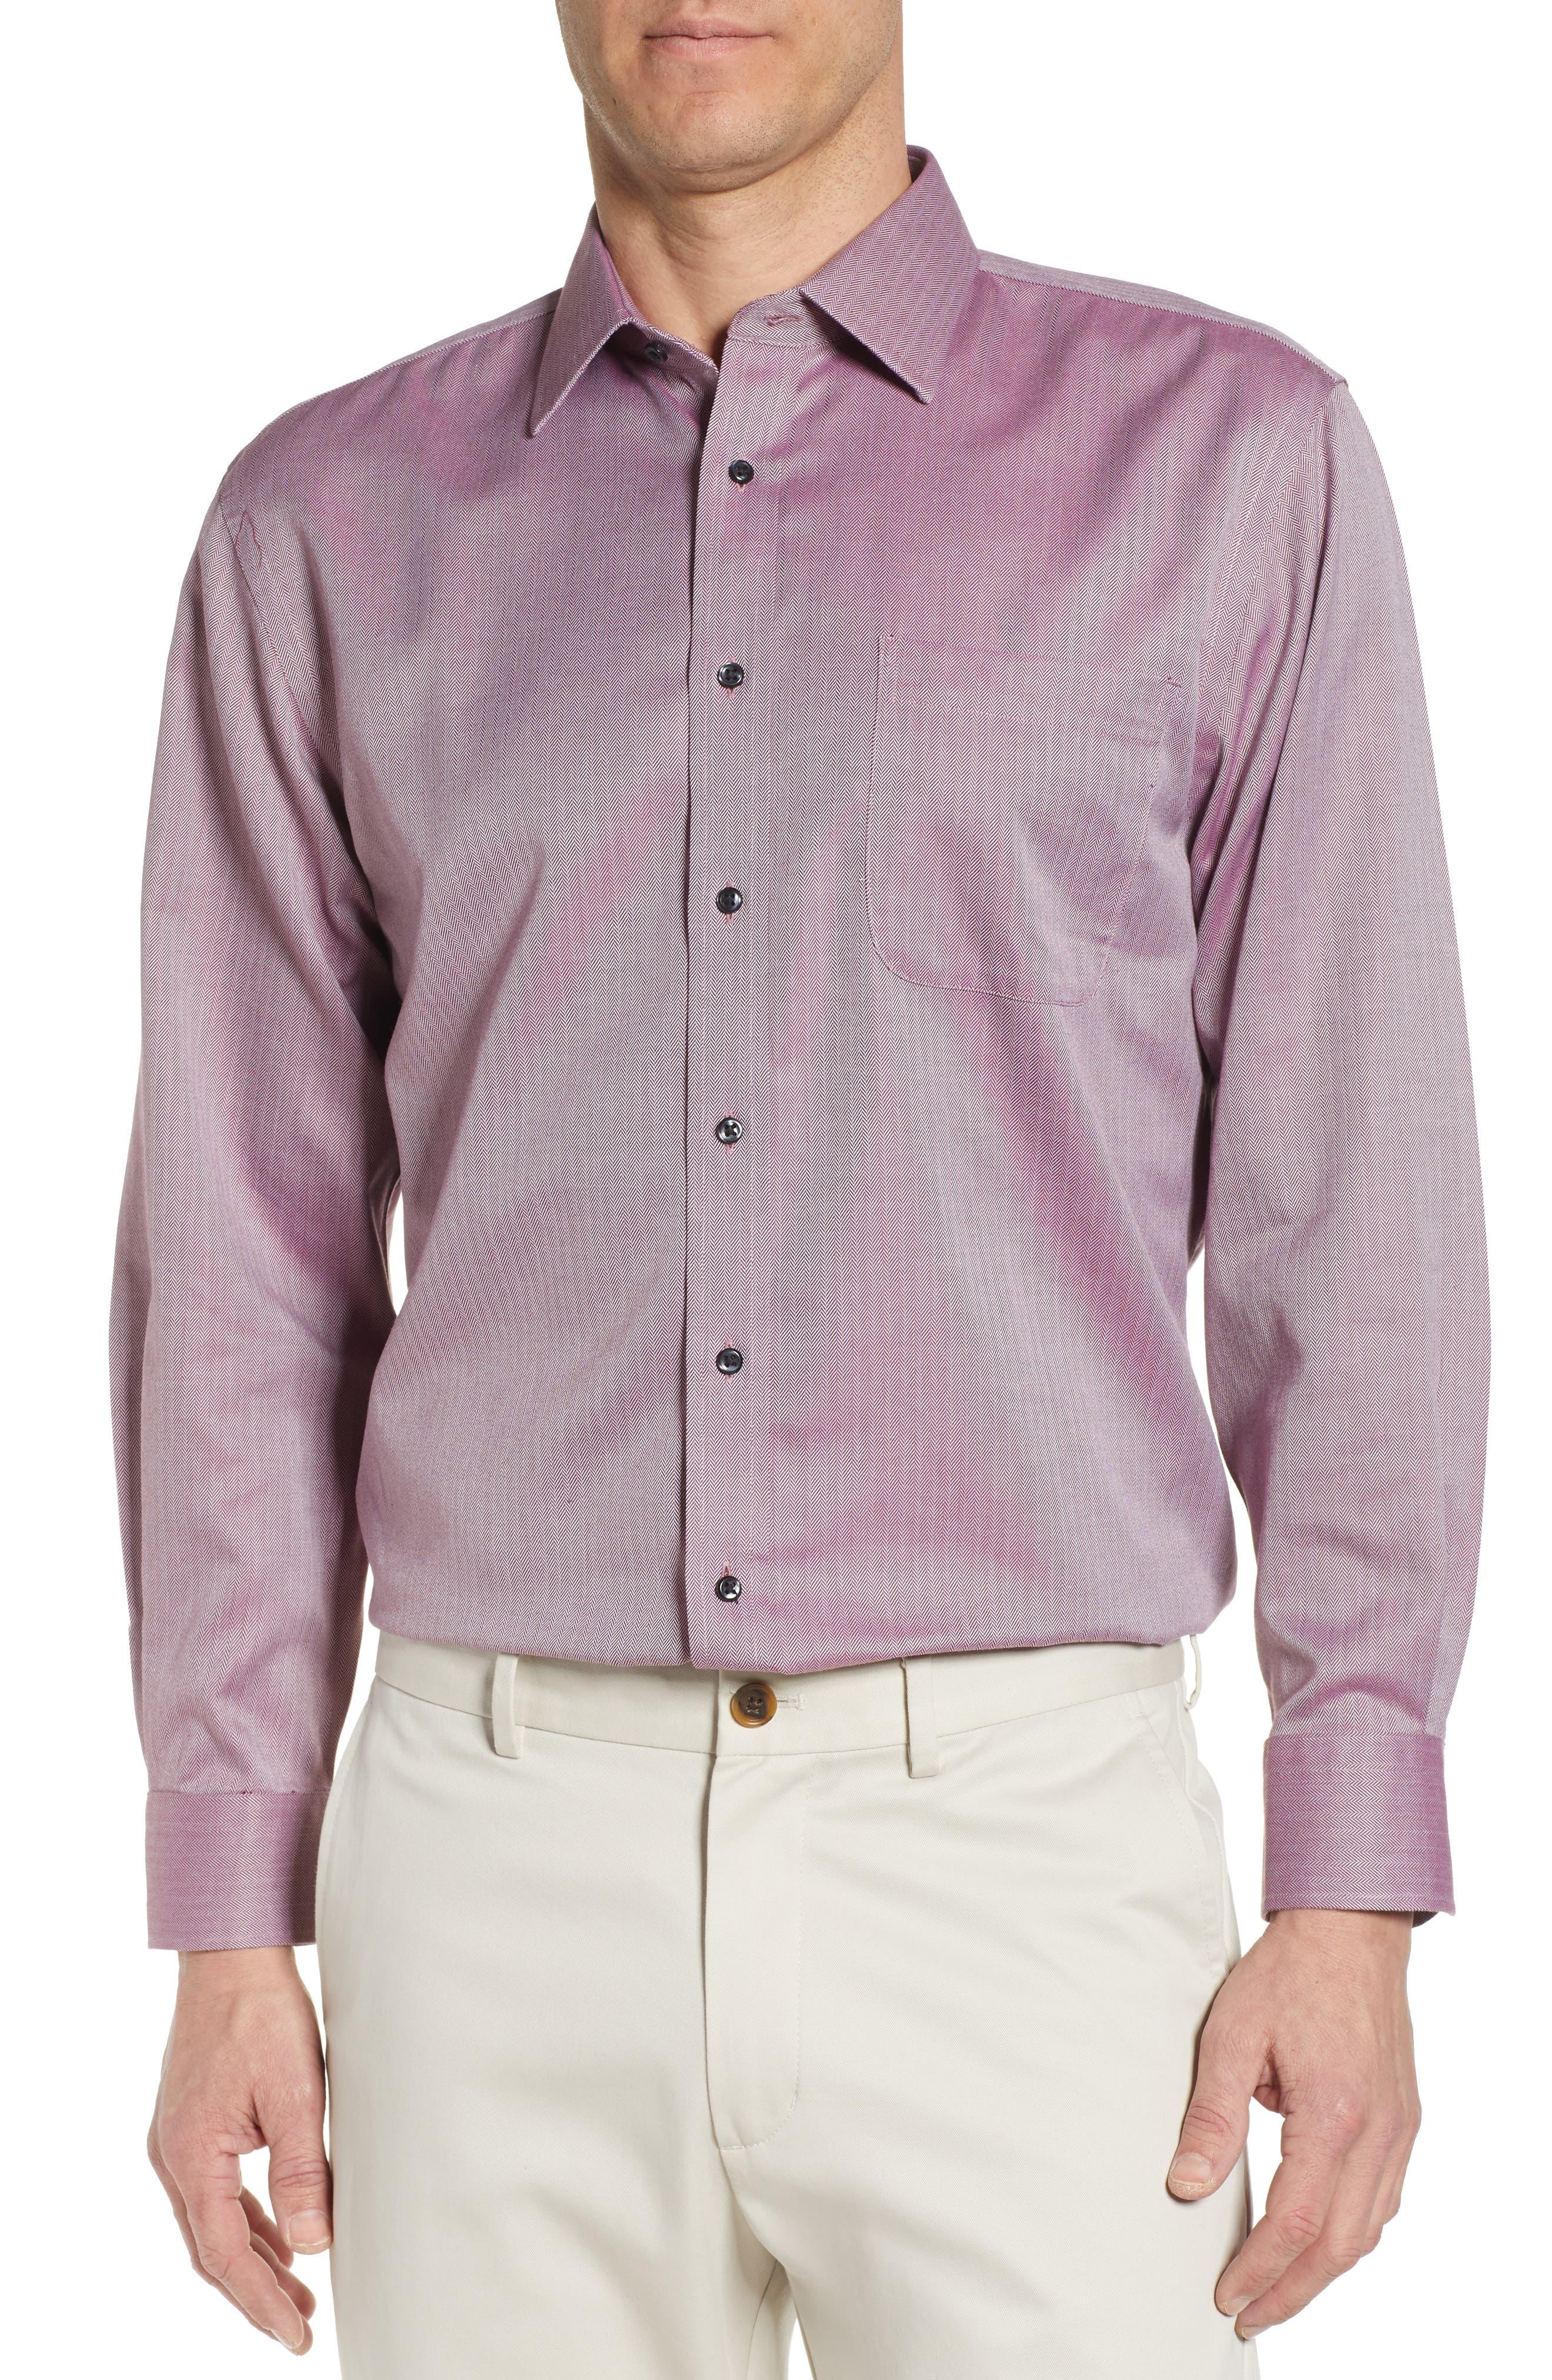 Nordstrom Shop Smartcare(TM) Traditional Fit Herringbone Dress Shirt - Burgundy